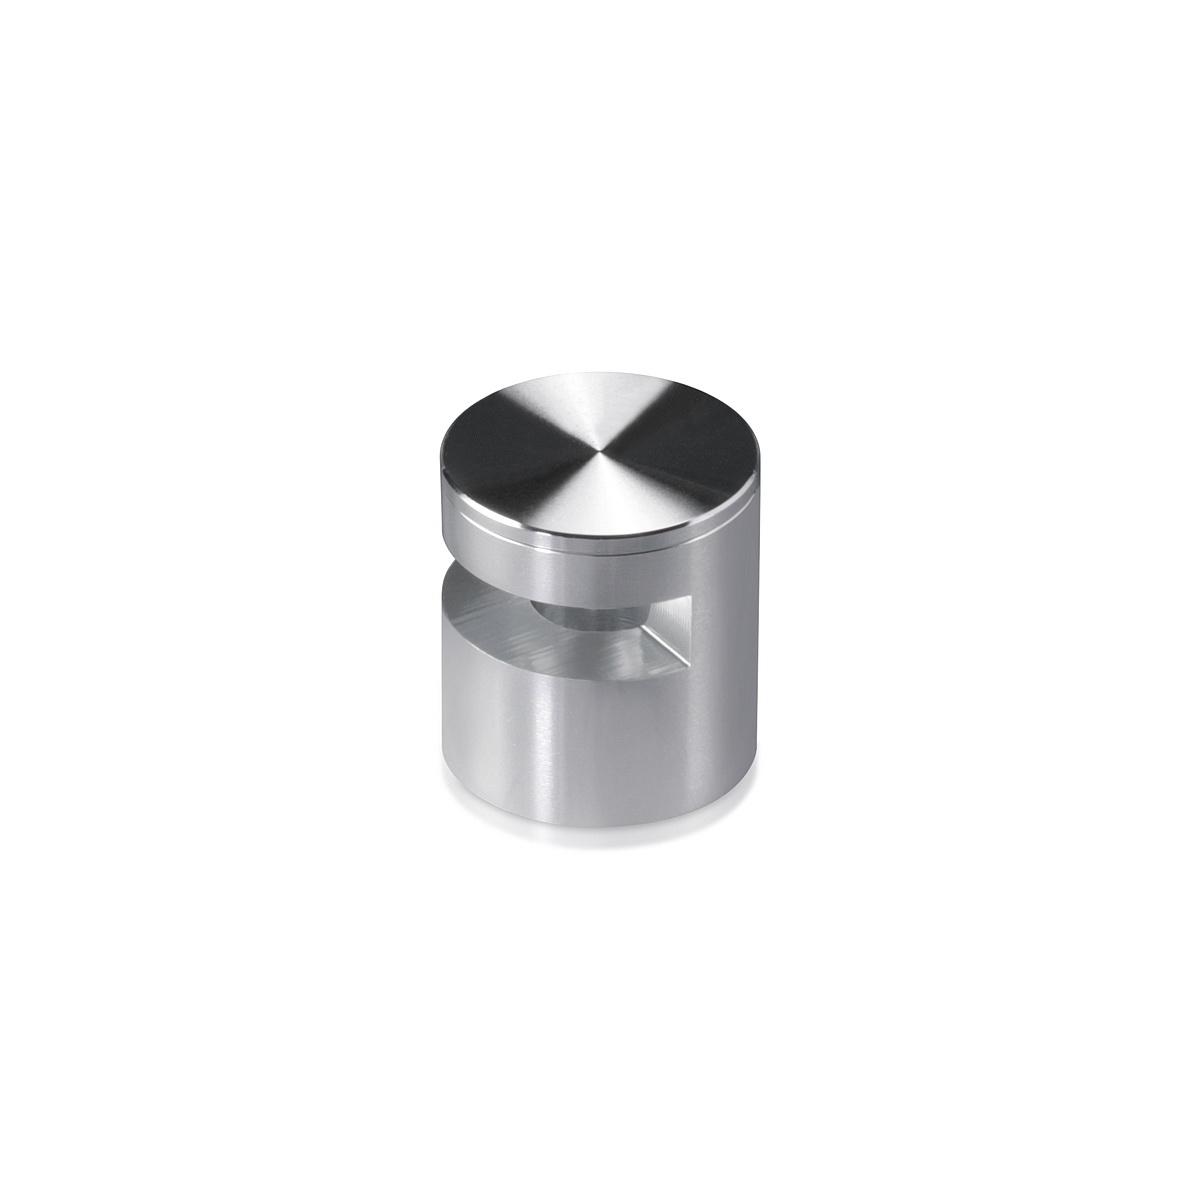 Aluminum Edge Grip, Diameter 1'', Standoff 9/16'' Clear Anodize Shiny Finish